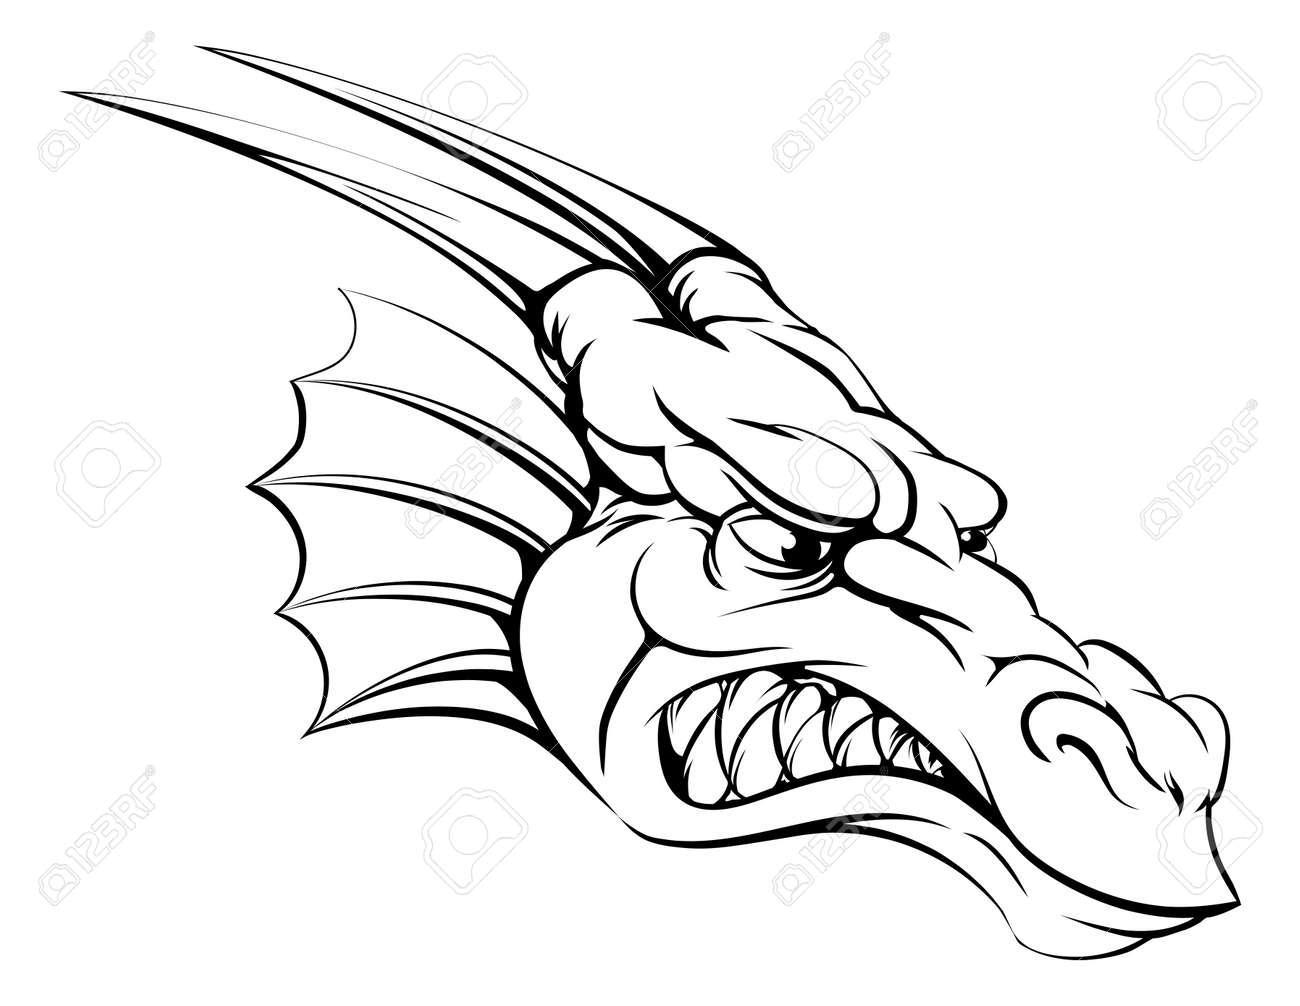 Dessin Tete De Dragon Gamboahinestrosa